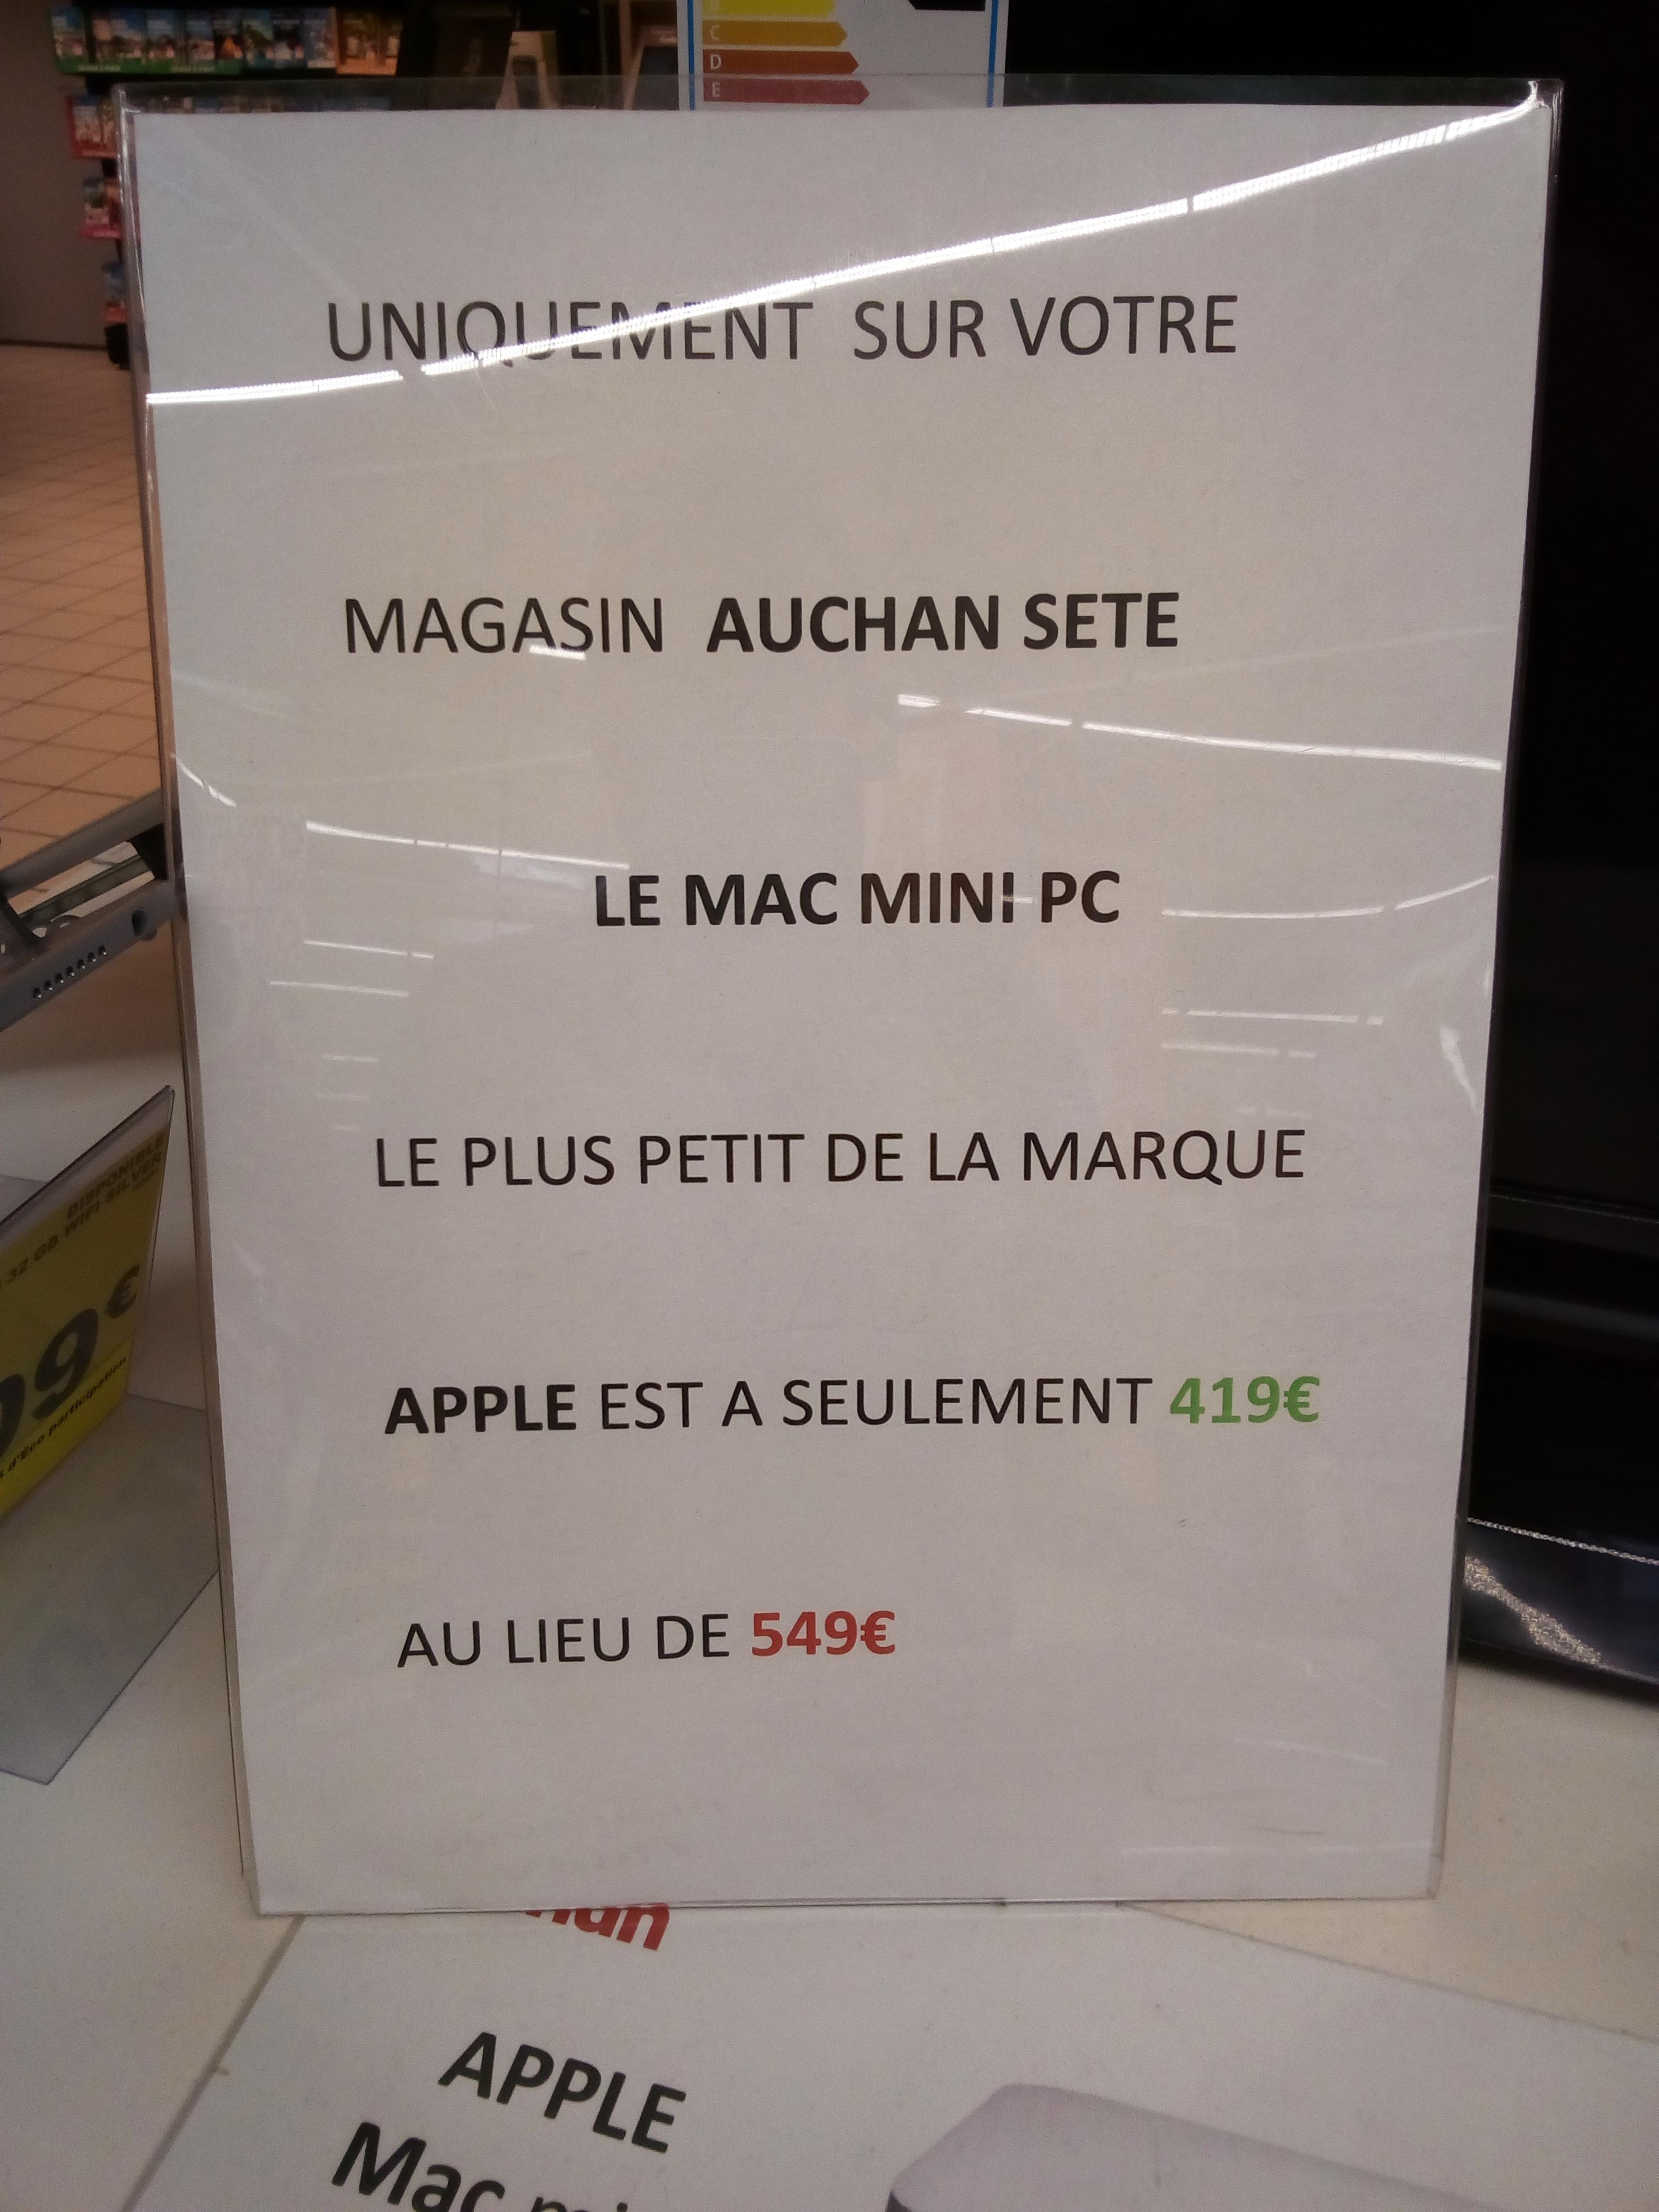 Mini PC Apple Mac Mini MGEM2F/A - i5 14Ghz, 4 Go de Ram, 500 Go